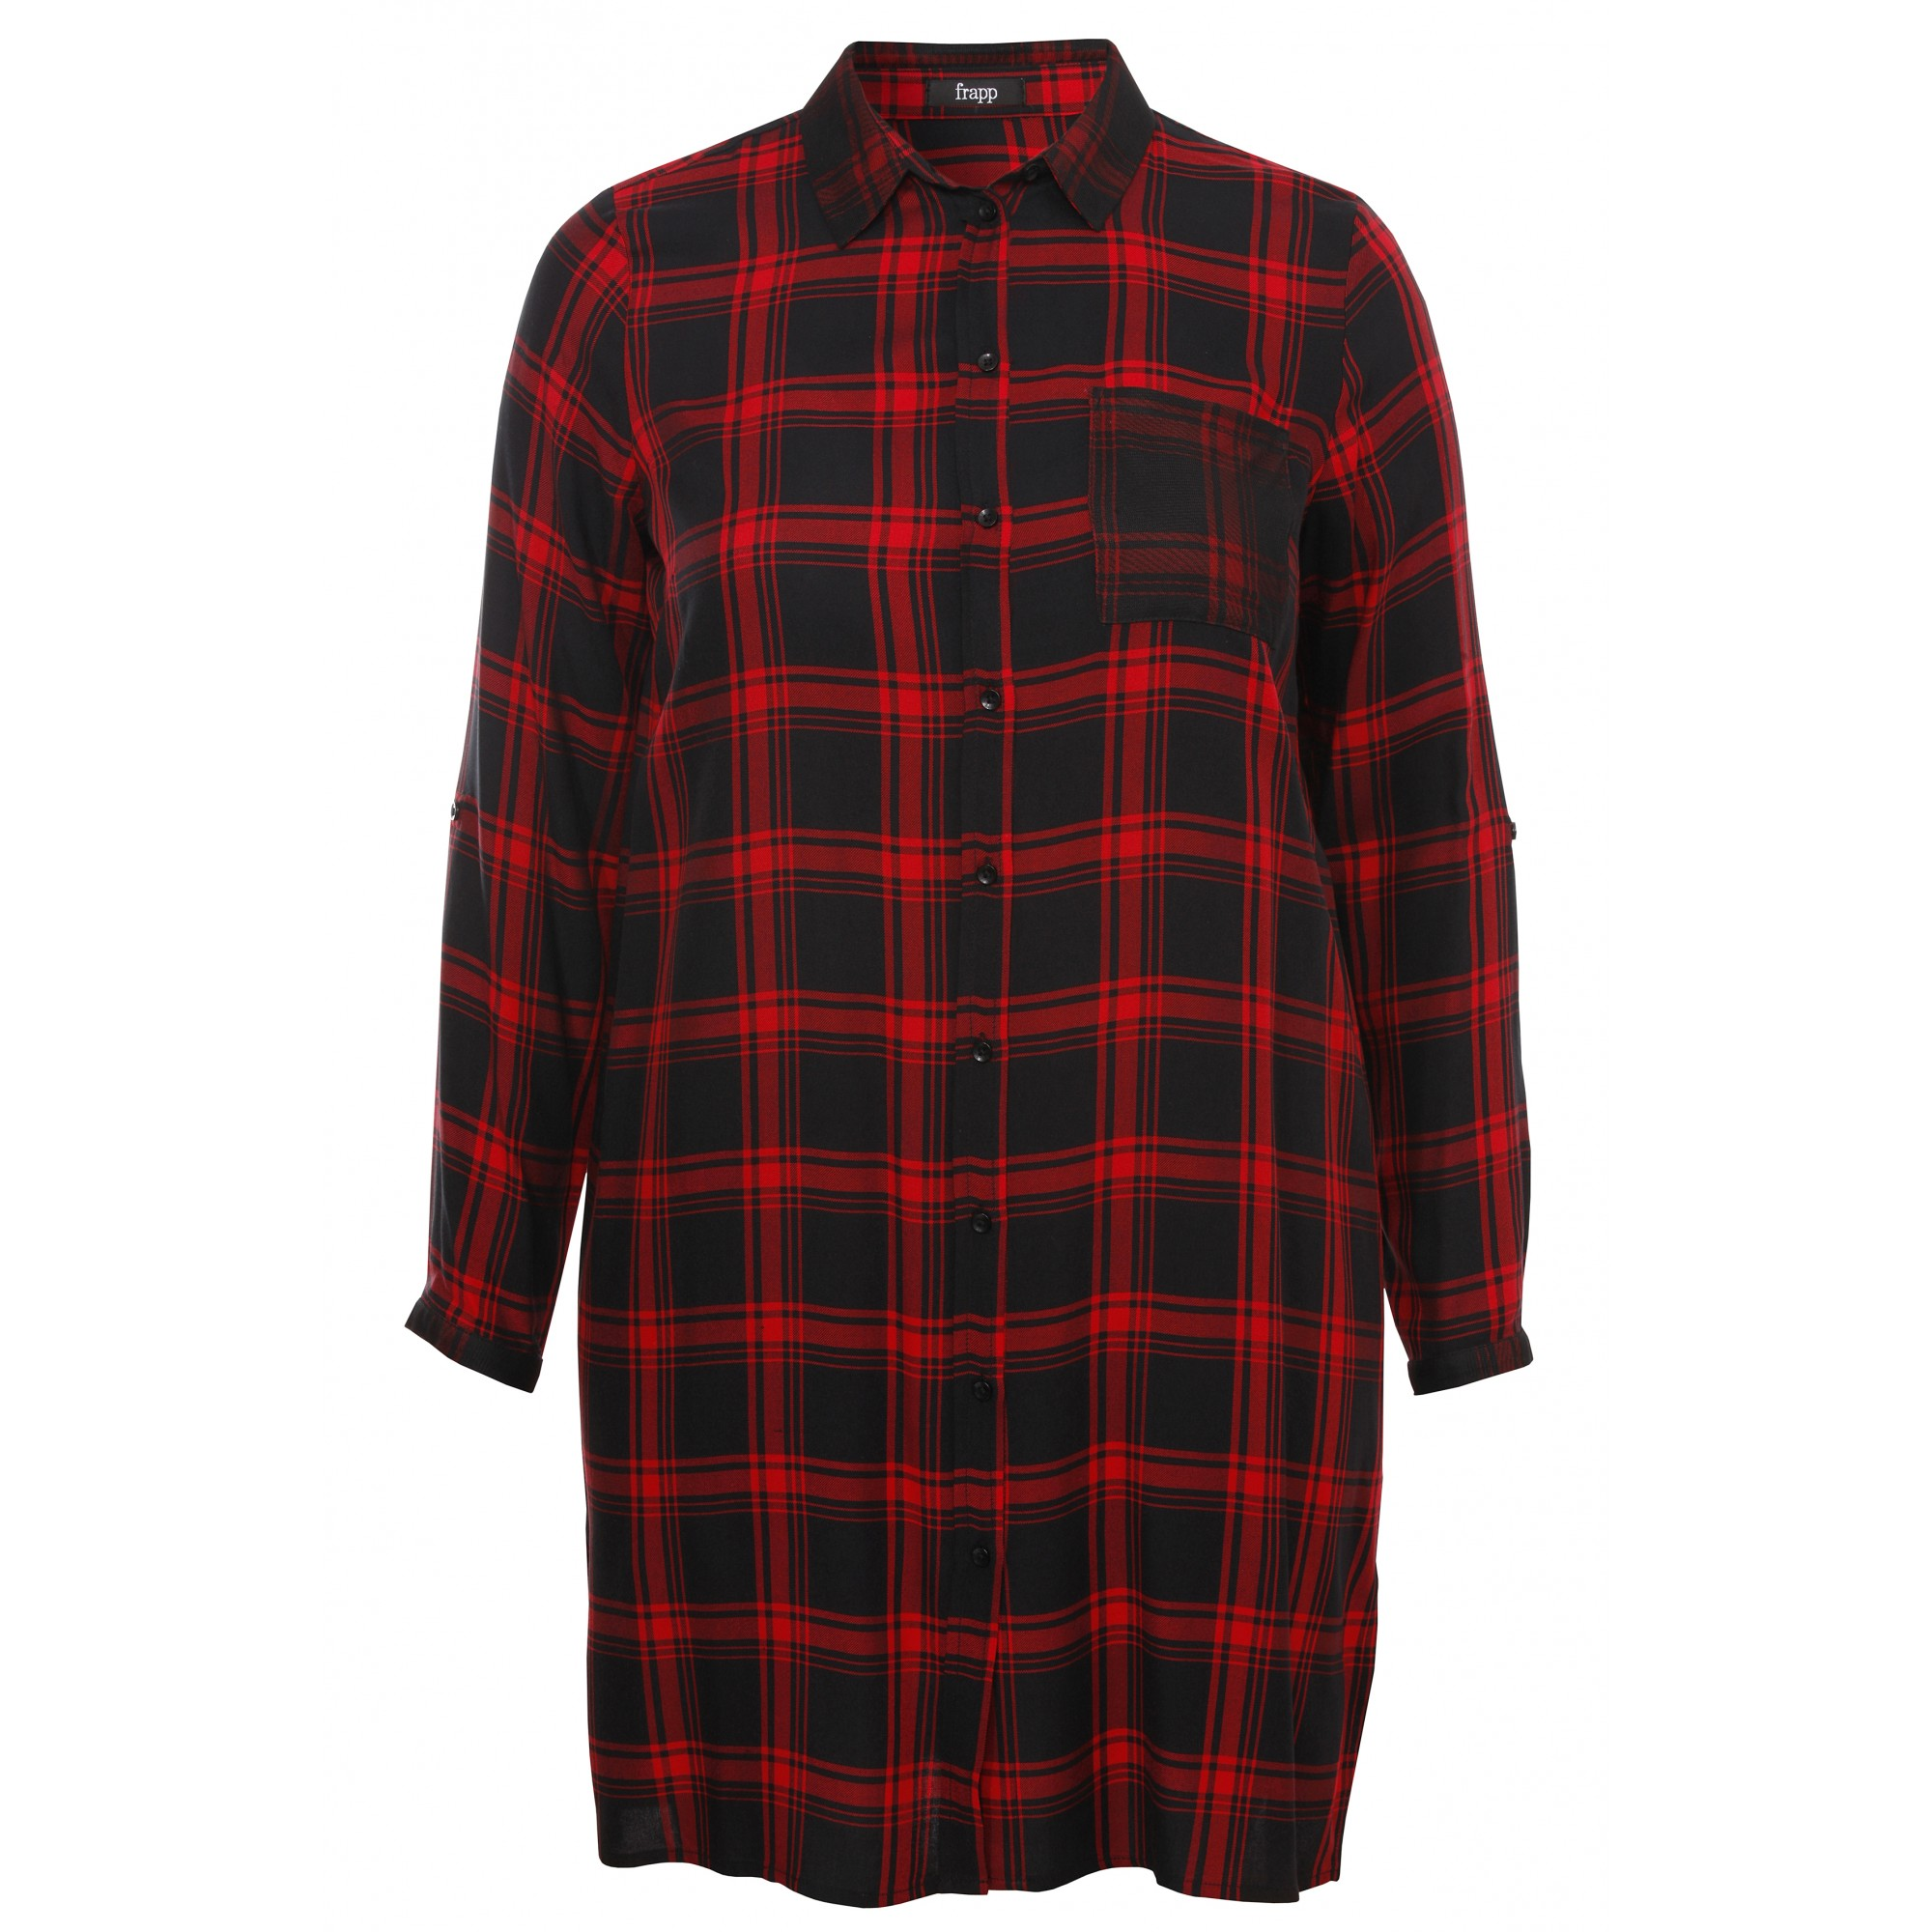 Luftiges Blusen-Kleid mit Karo-Muster